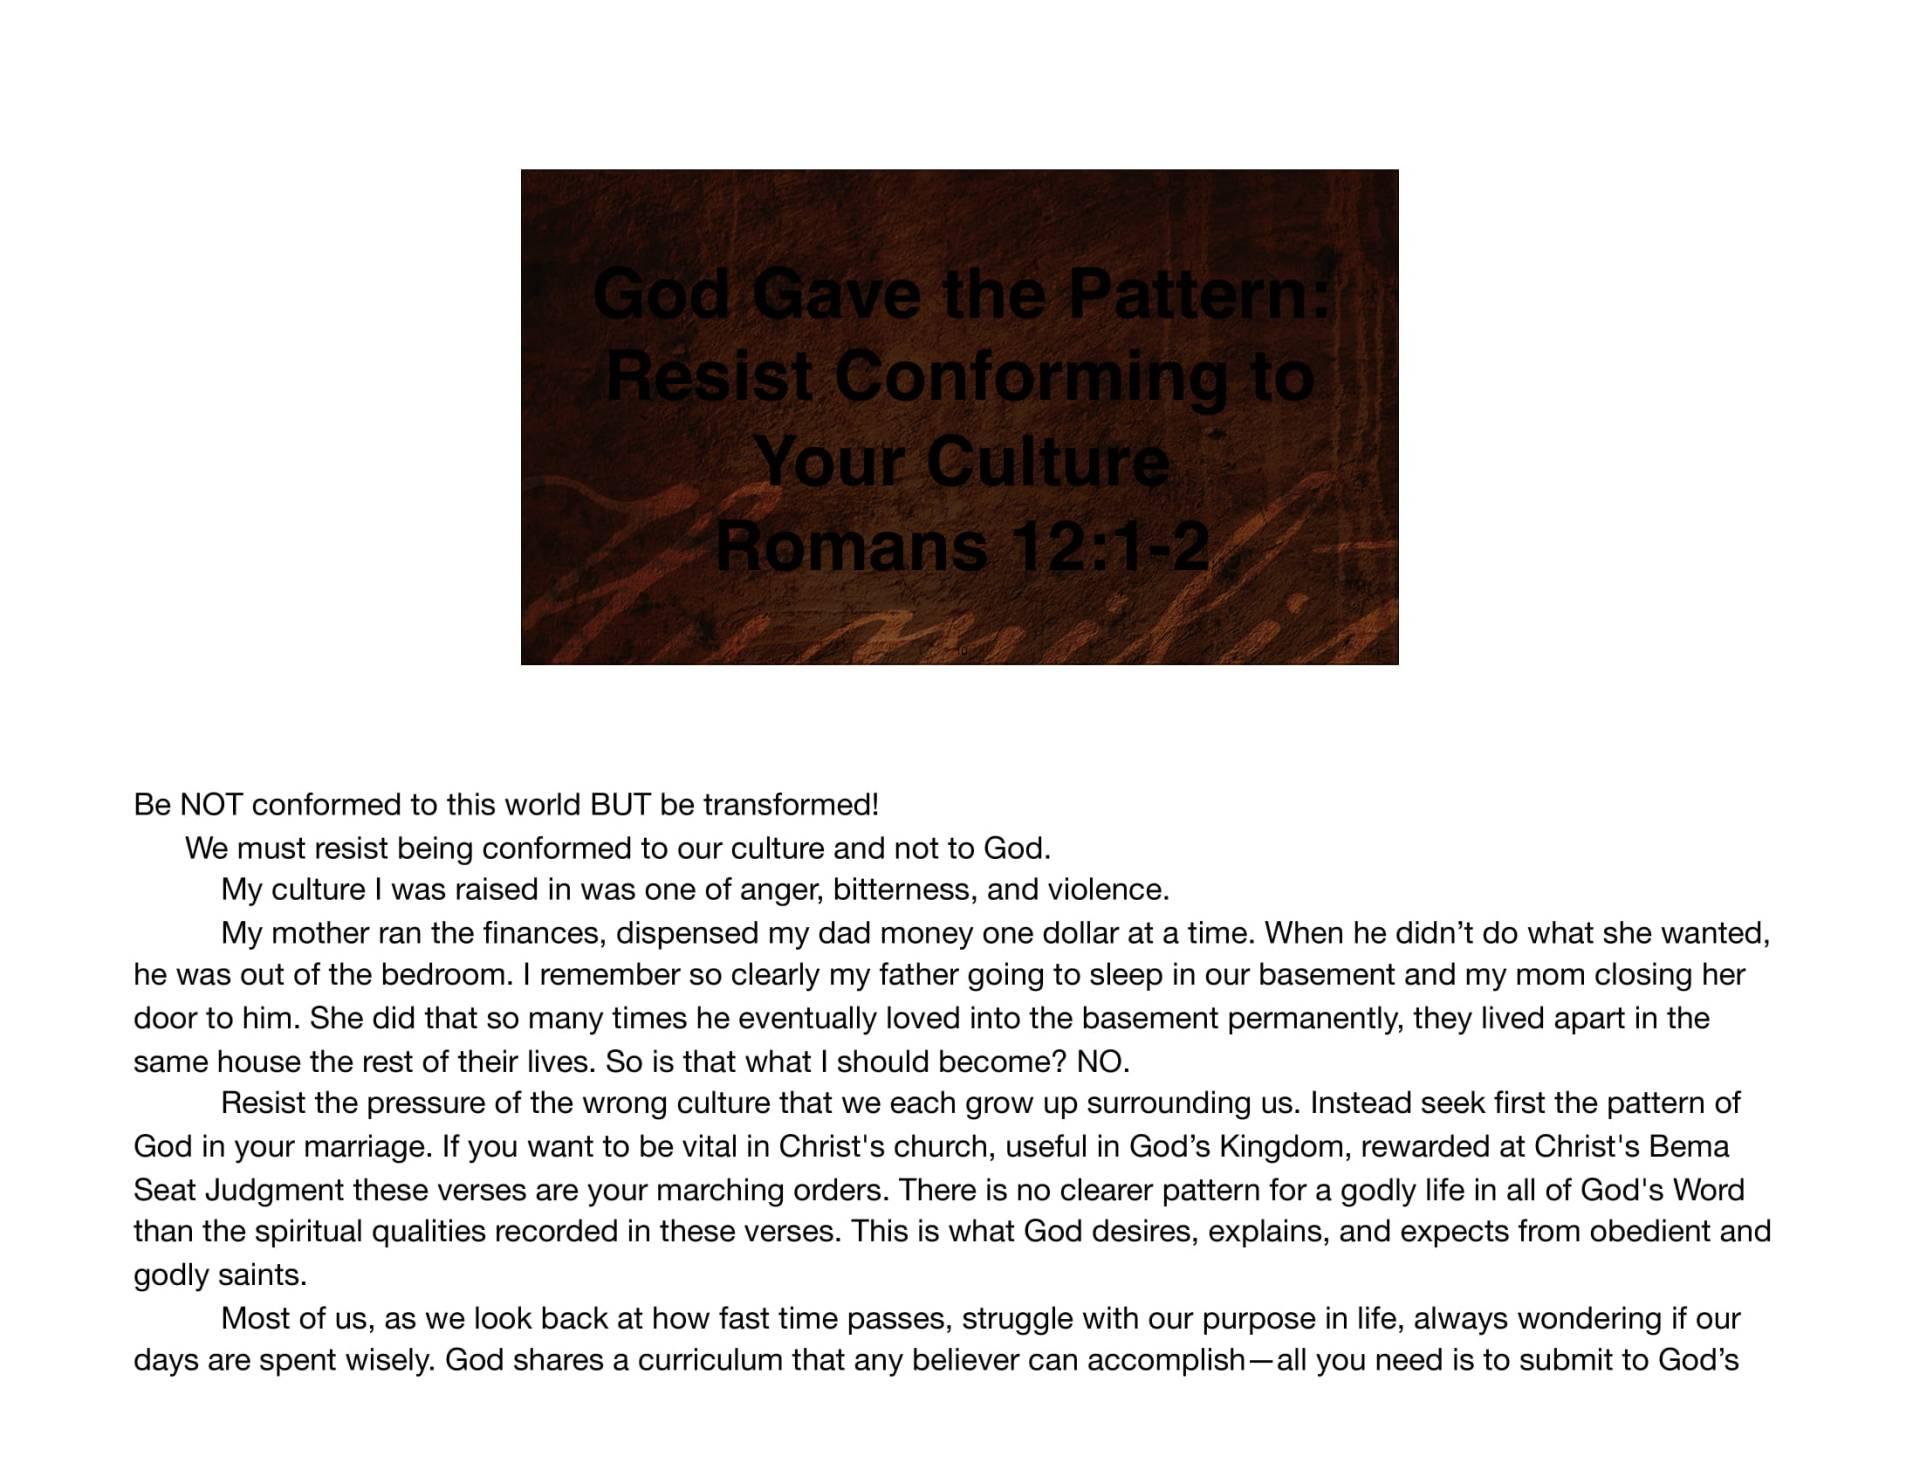 LGI-04 - Caution Men - Spiritual Maturity Is Not Automatic-10